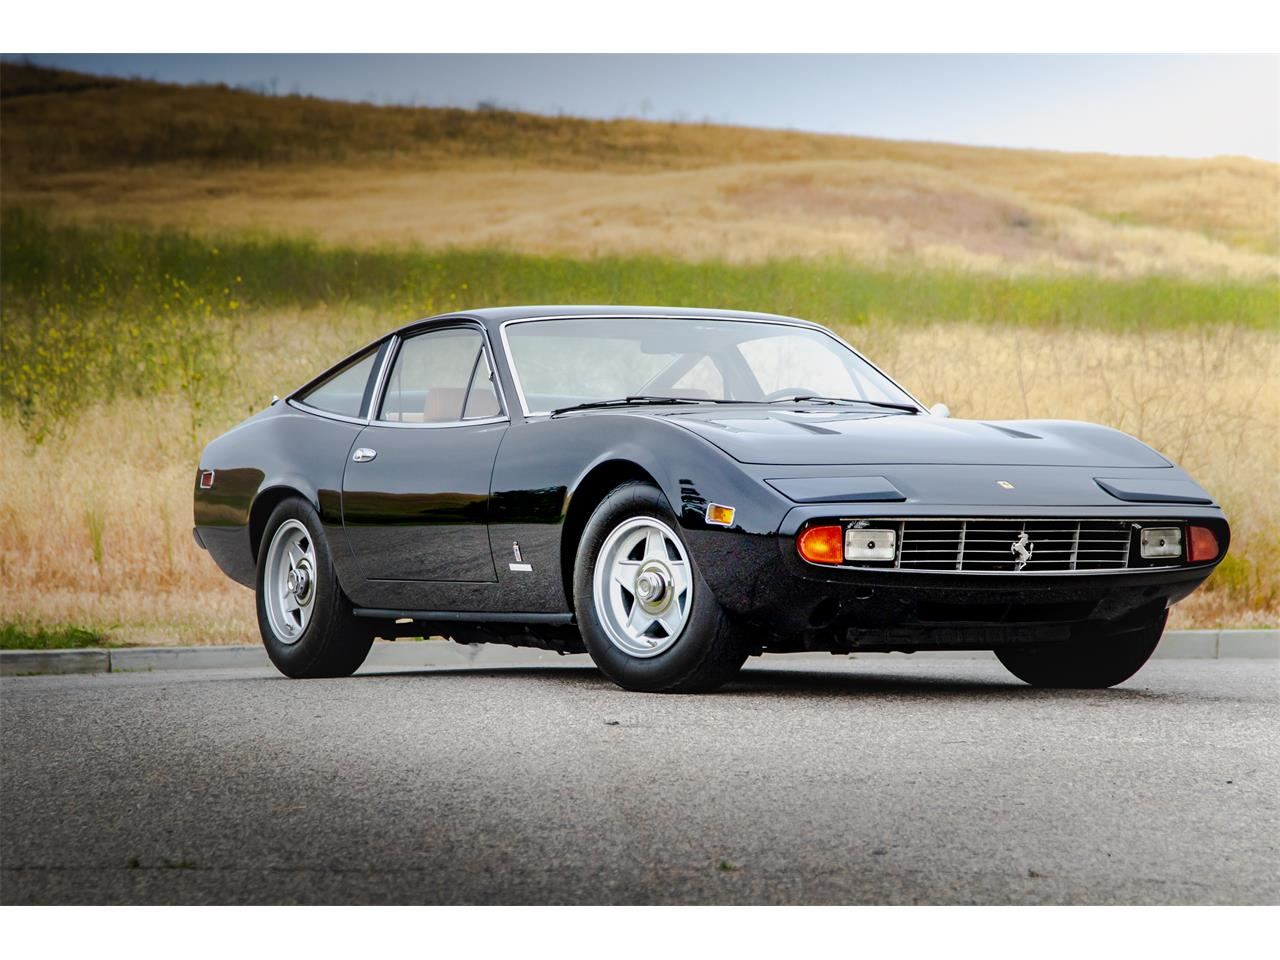 1972 Ferrari 365 GT4 (CC-1220563) for sale in Irvine, California